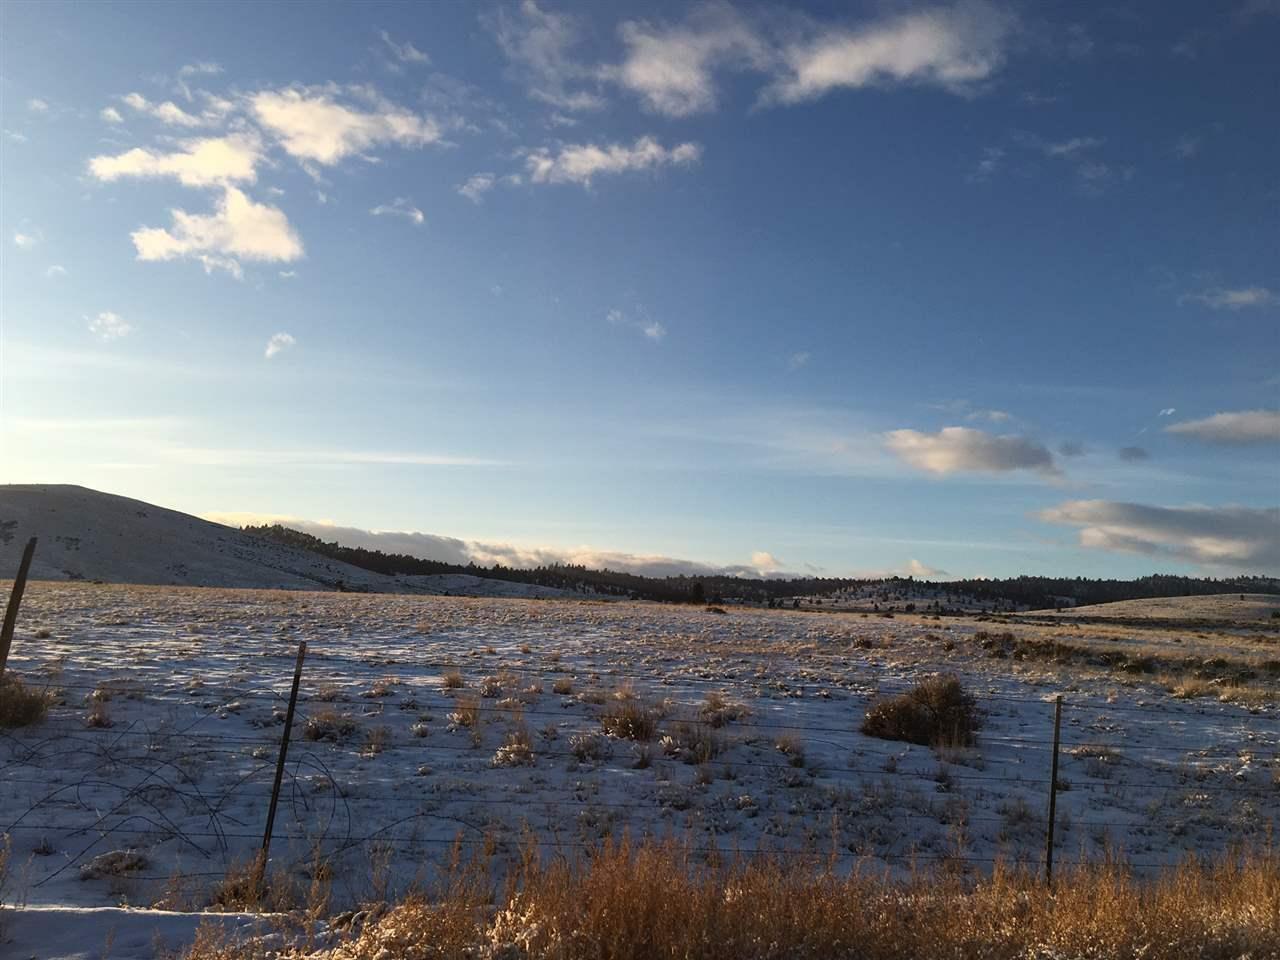 Tbd 3 Woodland Hills Rd, Helena, MT - USA (photo 5)